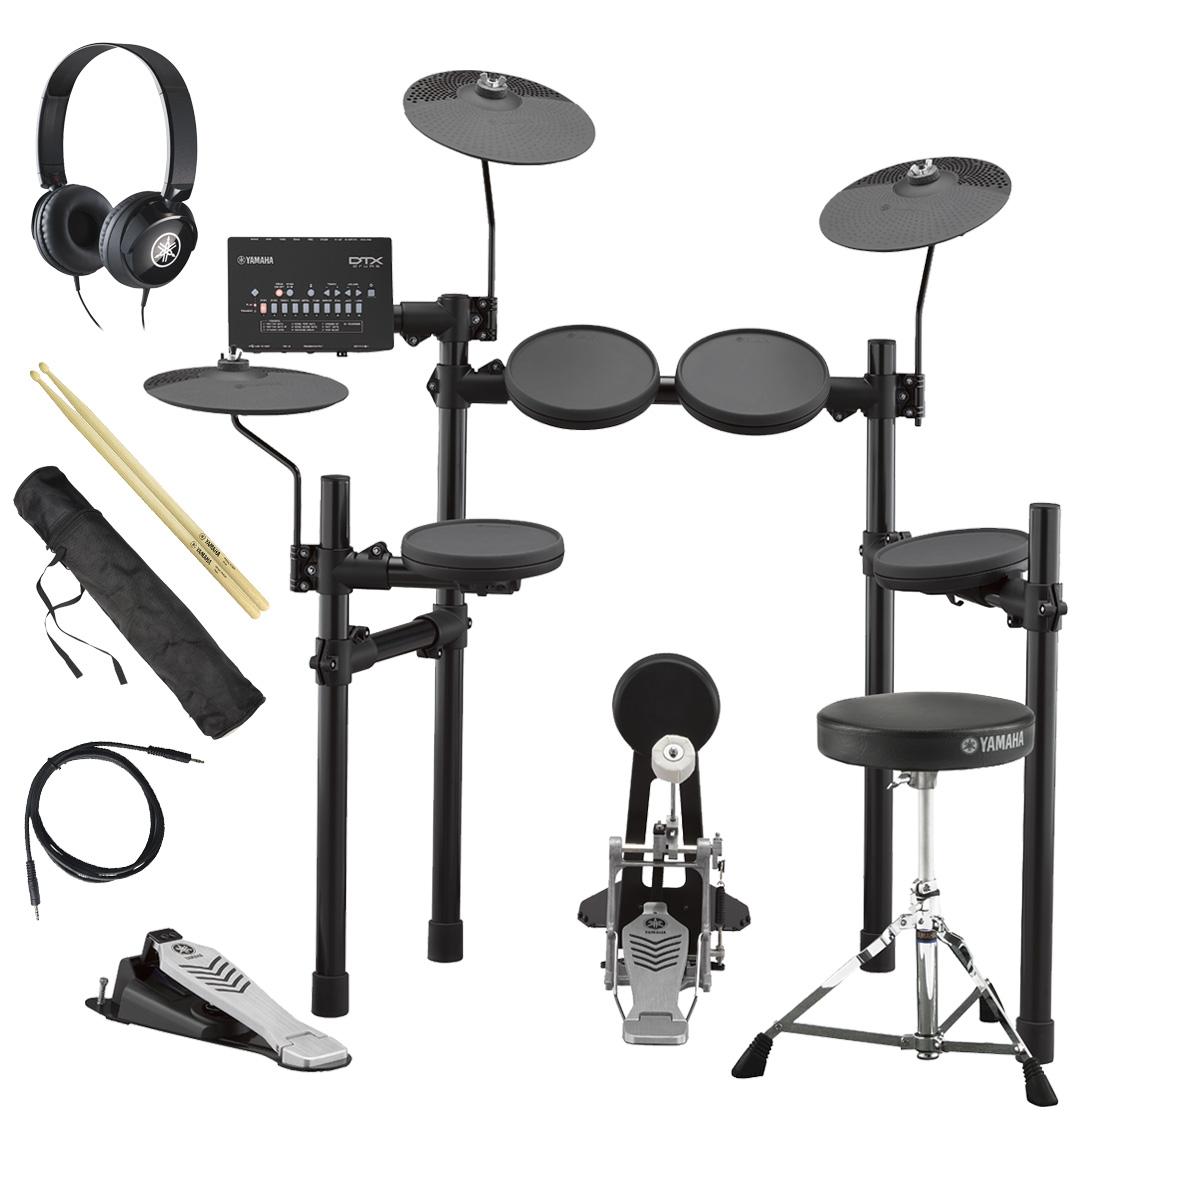 YAMAHA / DTX432KS 電子ドラム ヤマハ純正ヘッドホンとスティックセット【YRK】